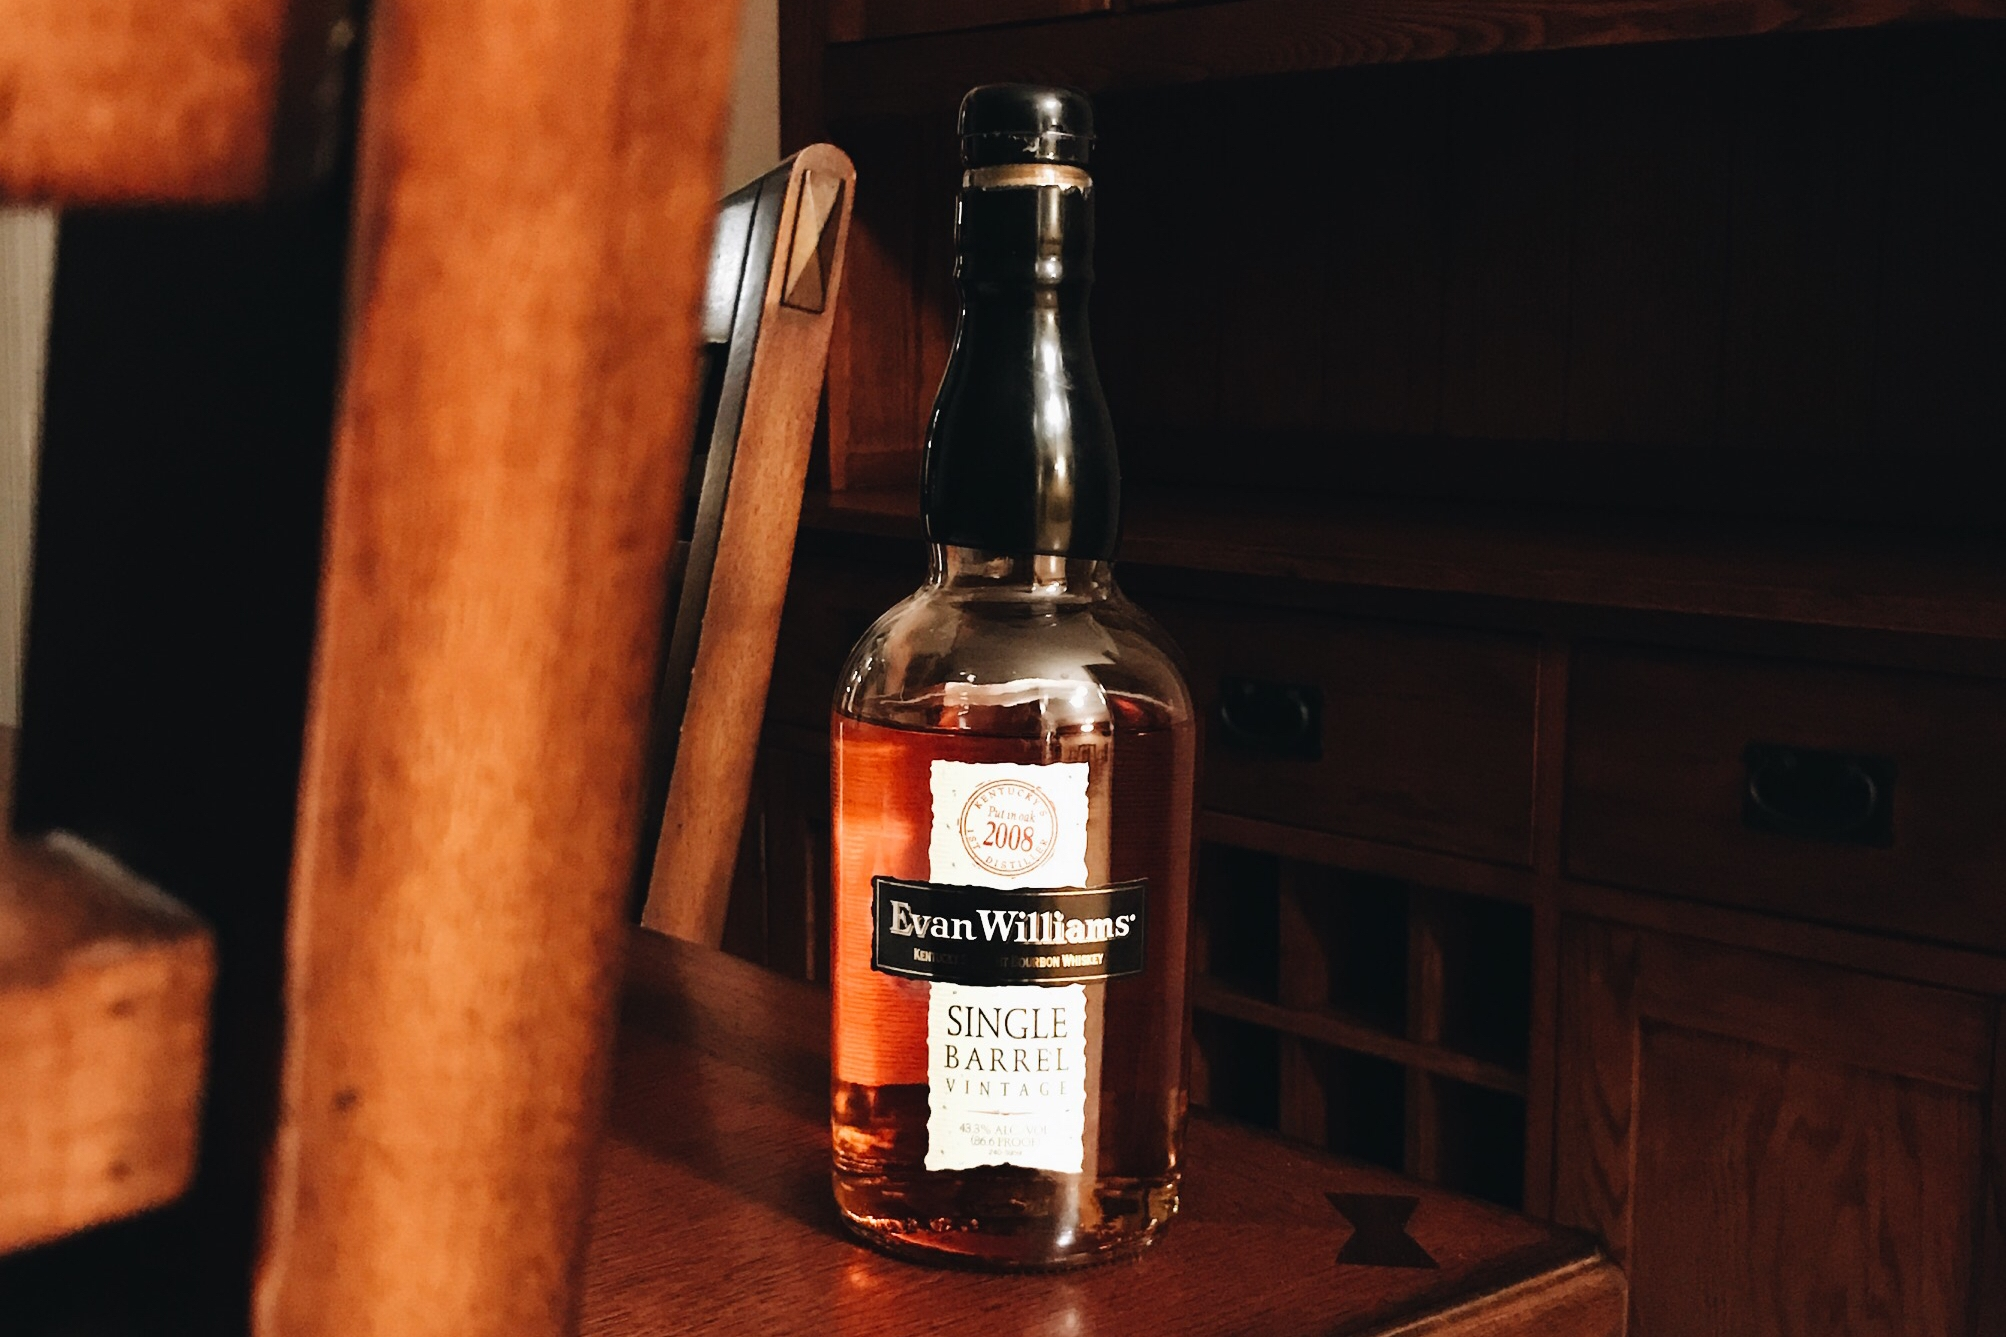 Evan Williams Single Barrel - More Info